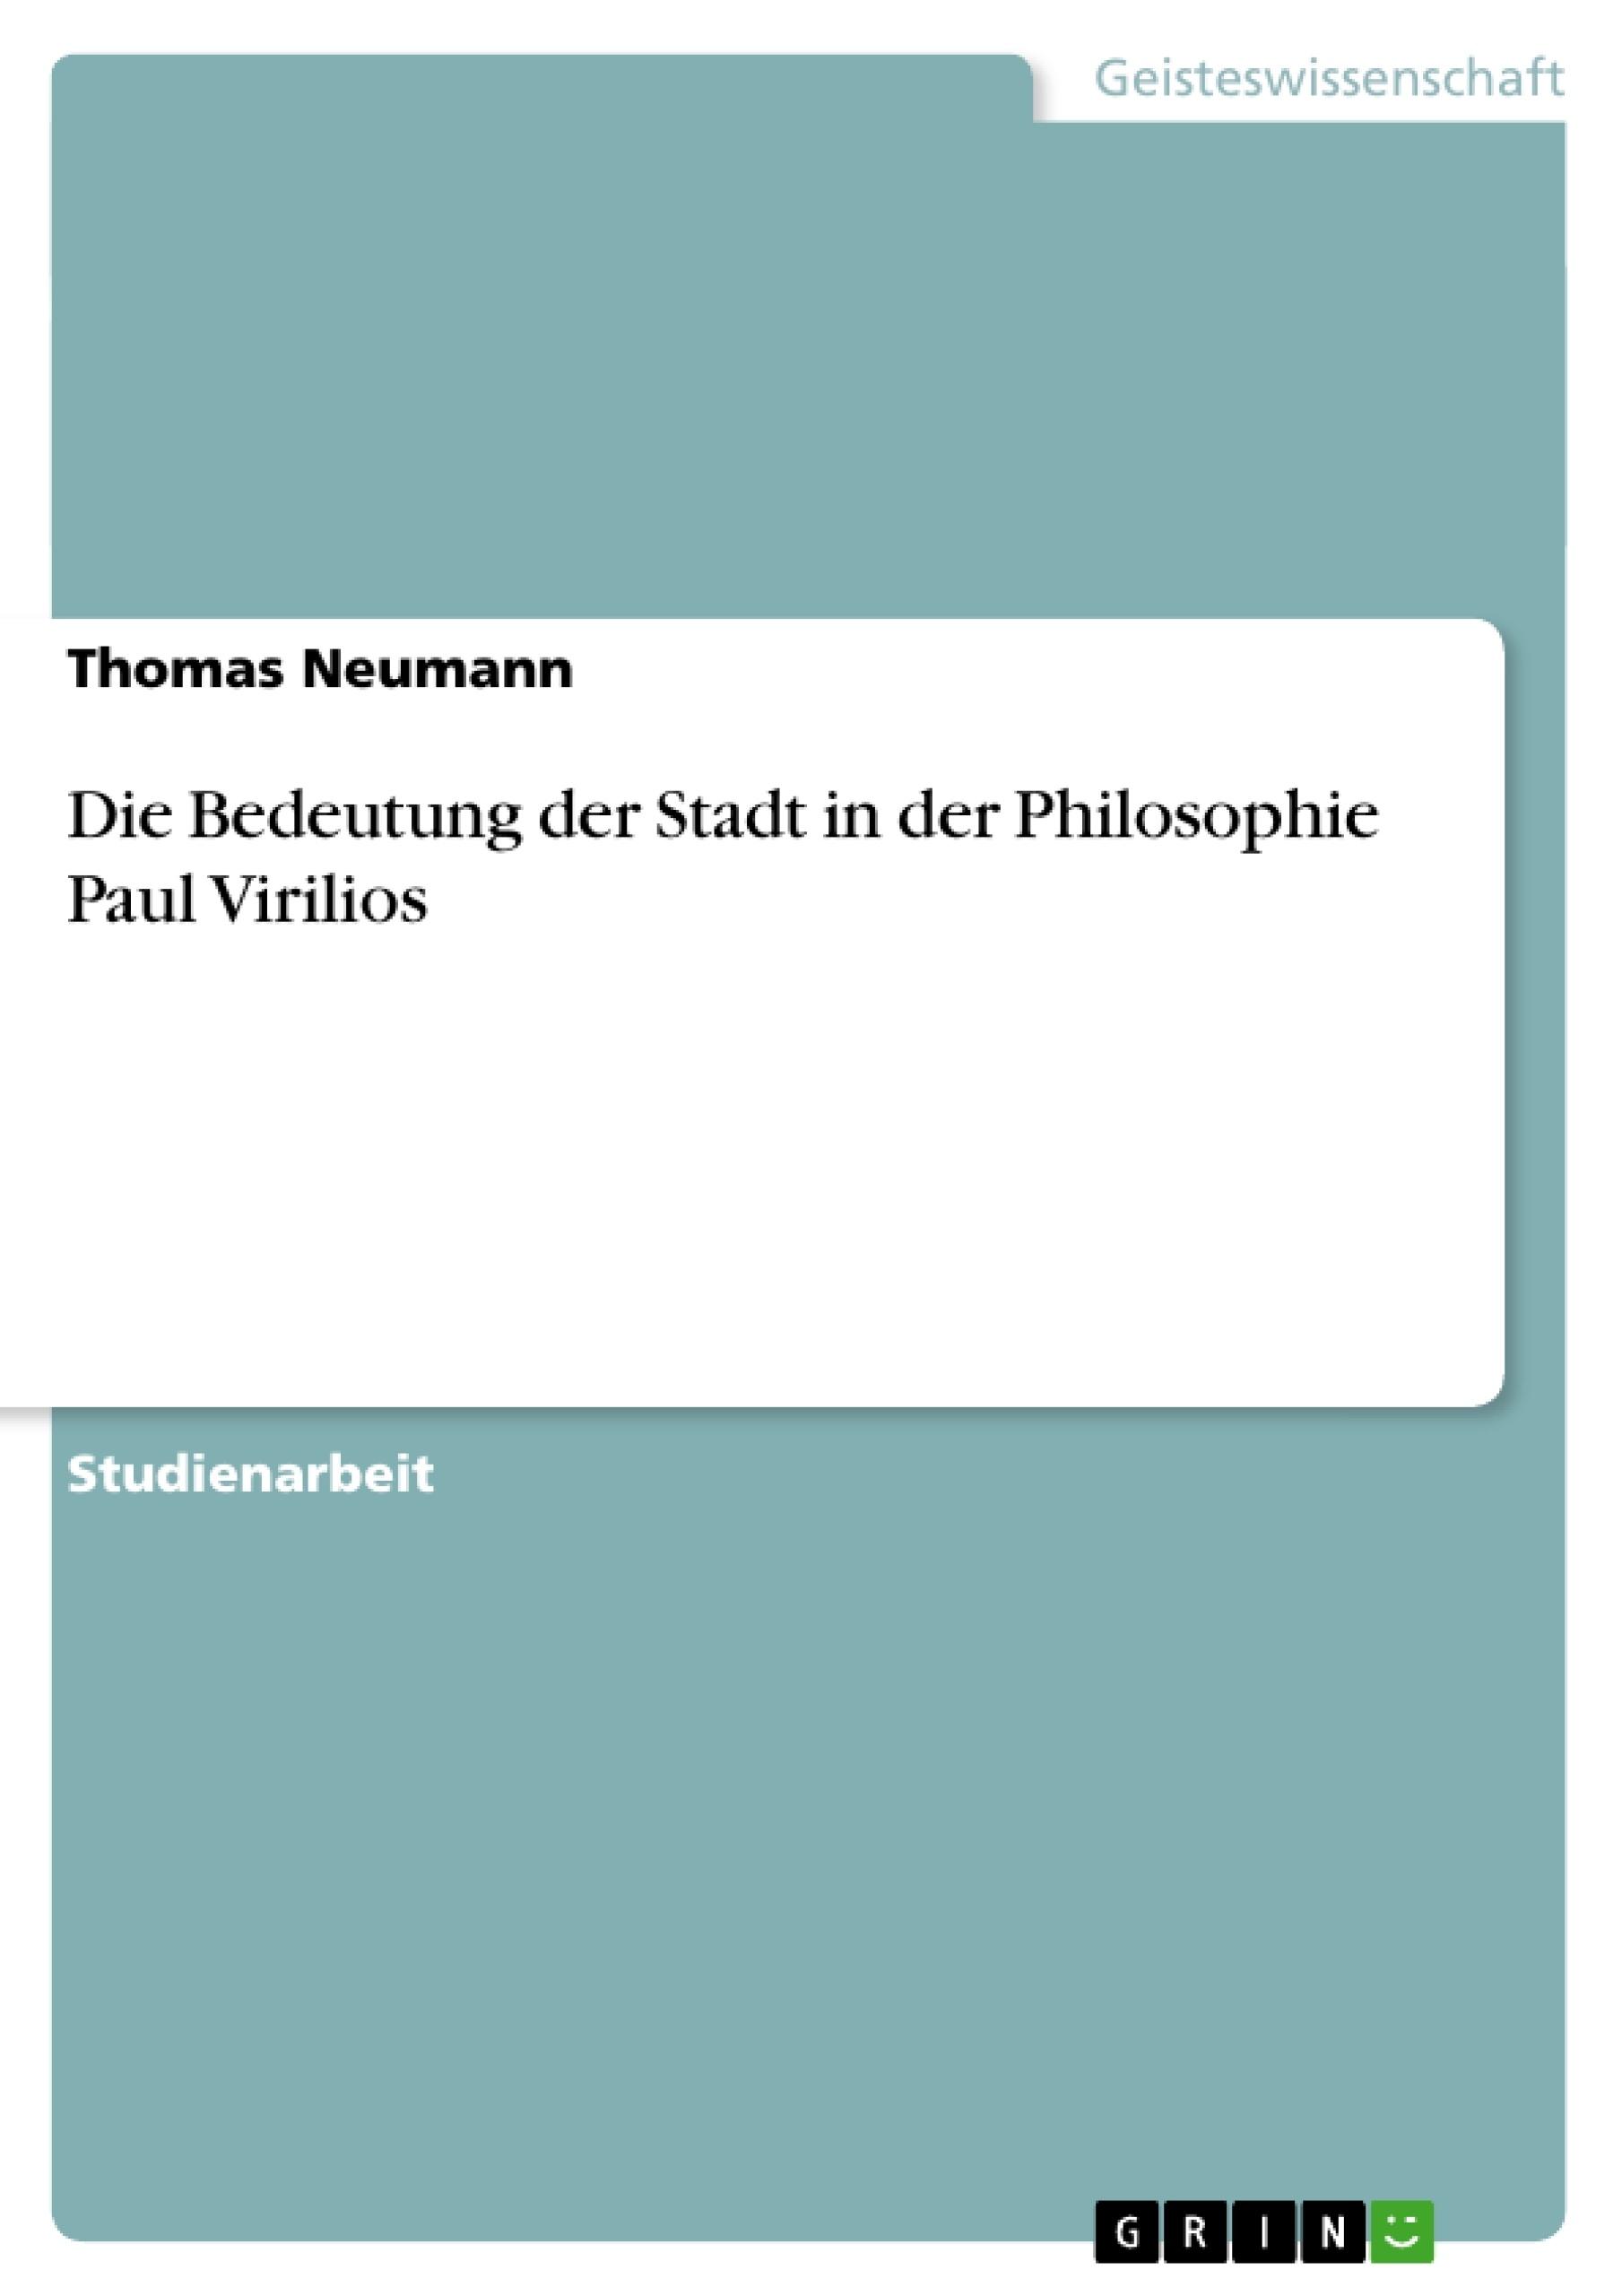 Titel: Die Bedeutung der Stadt in der Philosophie Paul Virilios